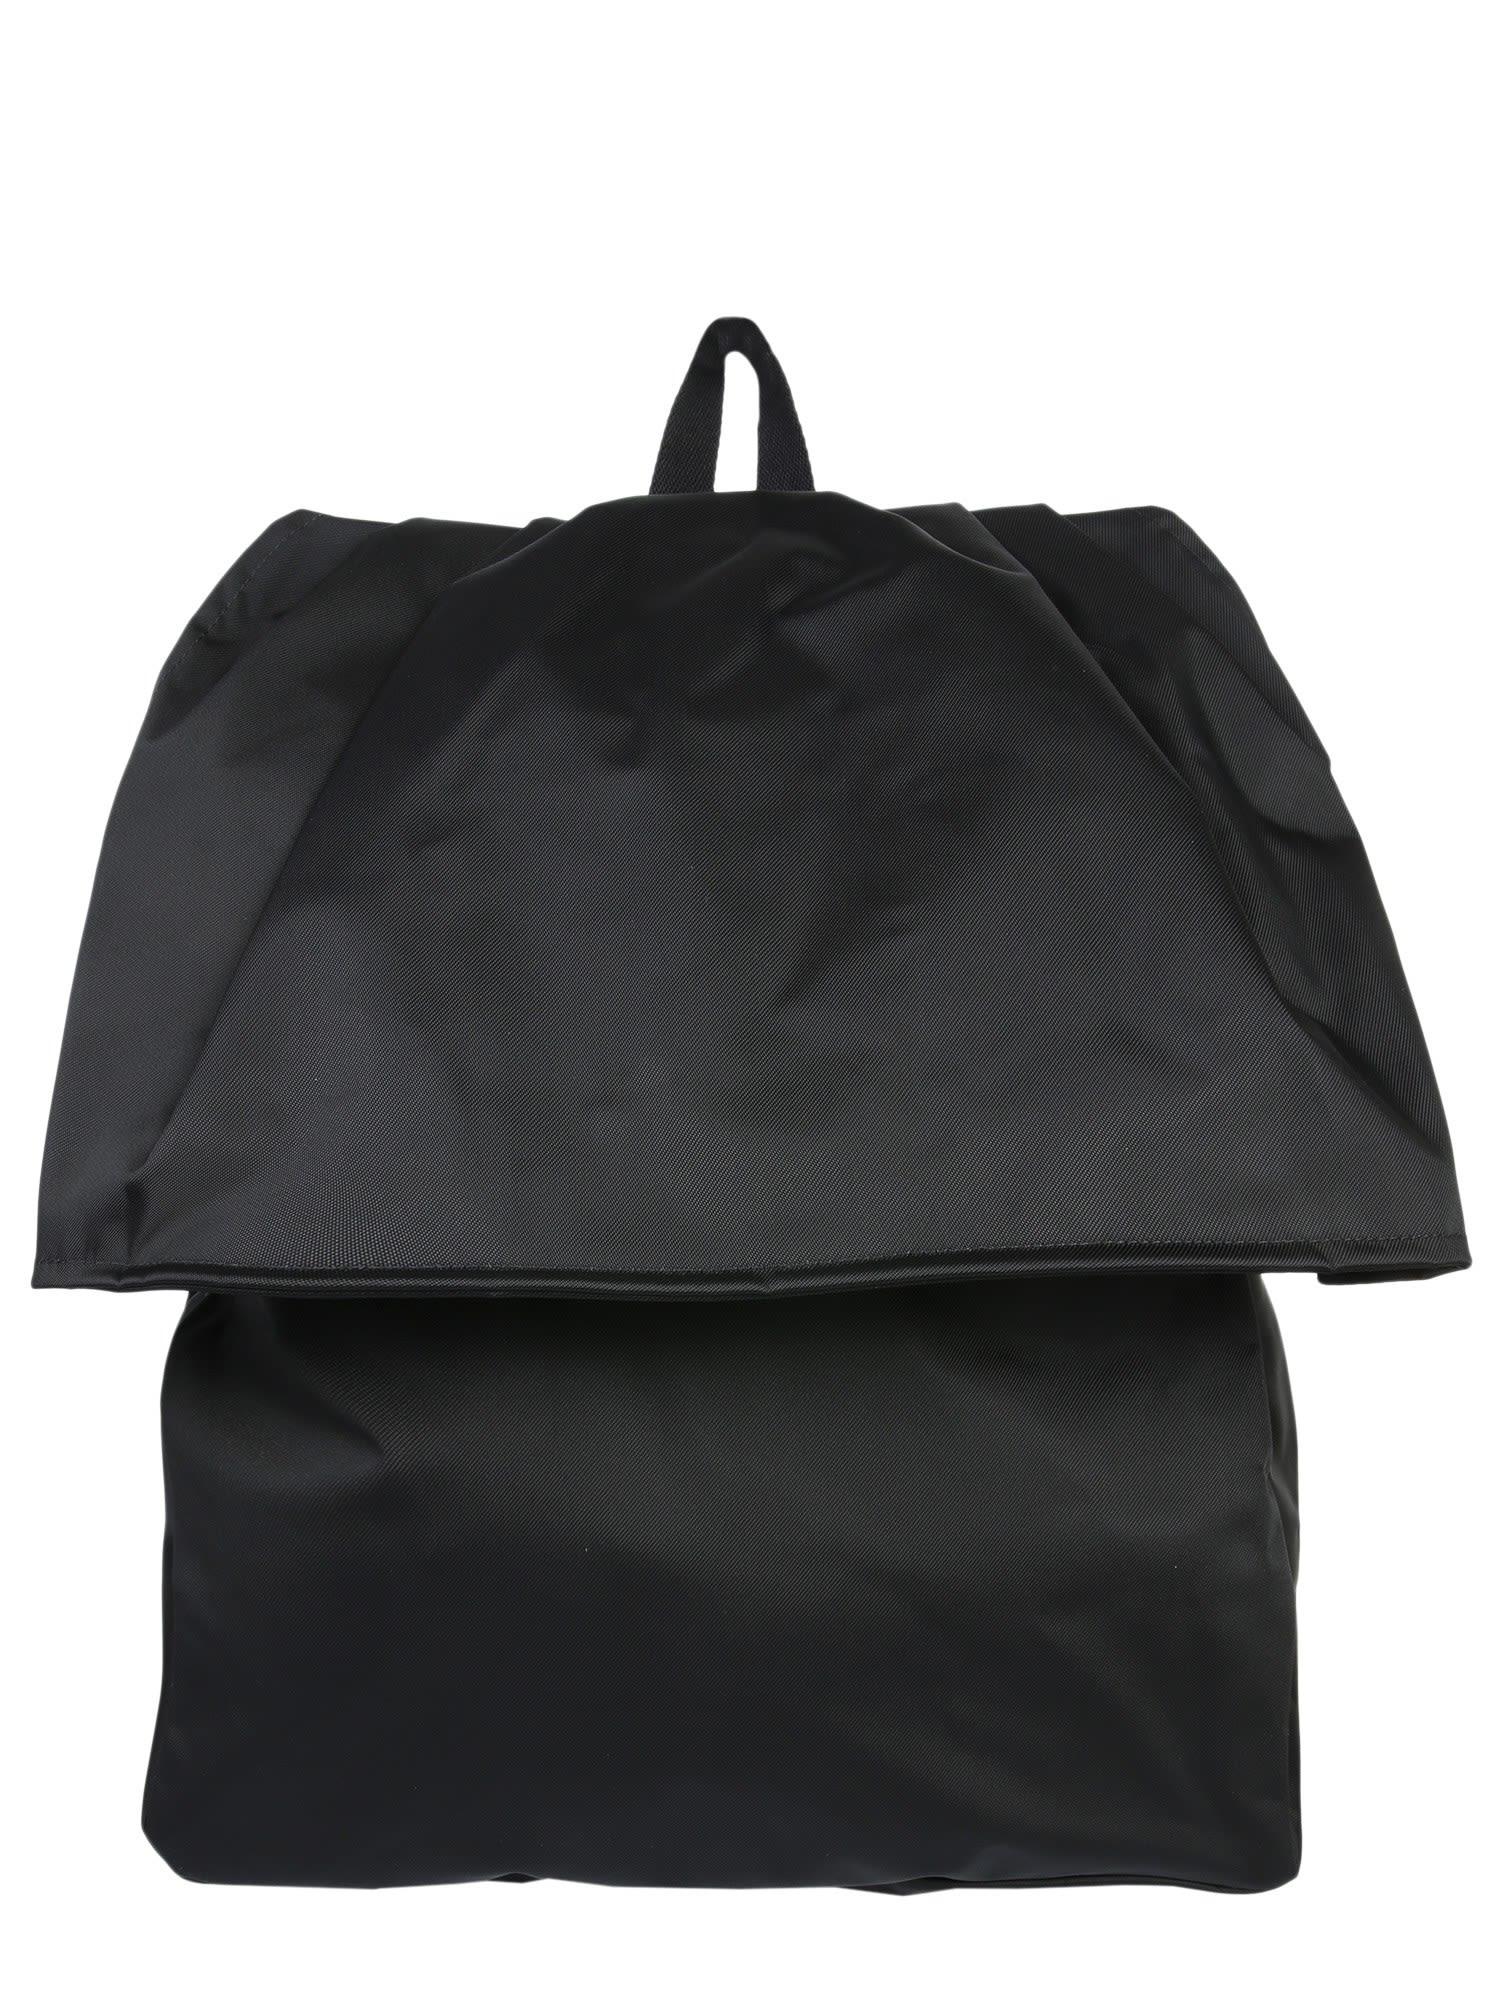 Eastpak by Raf simons Female Refined Backpack